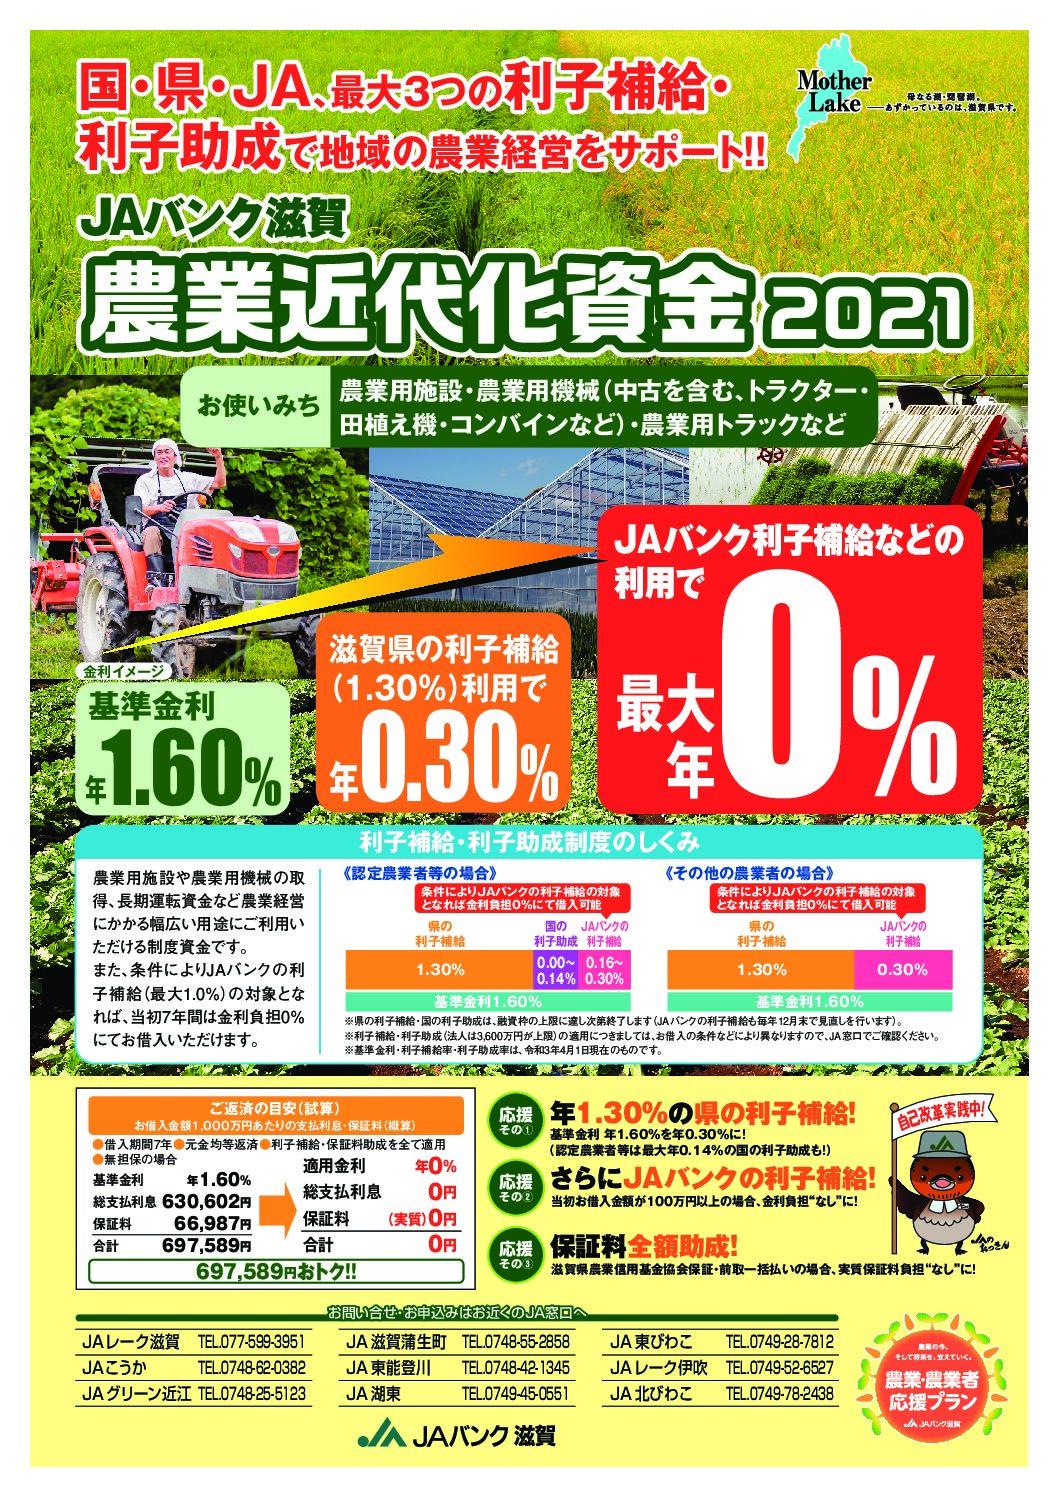 JAバンク滋賀 農業近代化資金2021